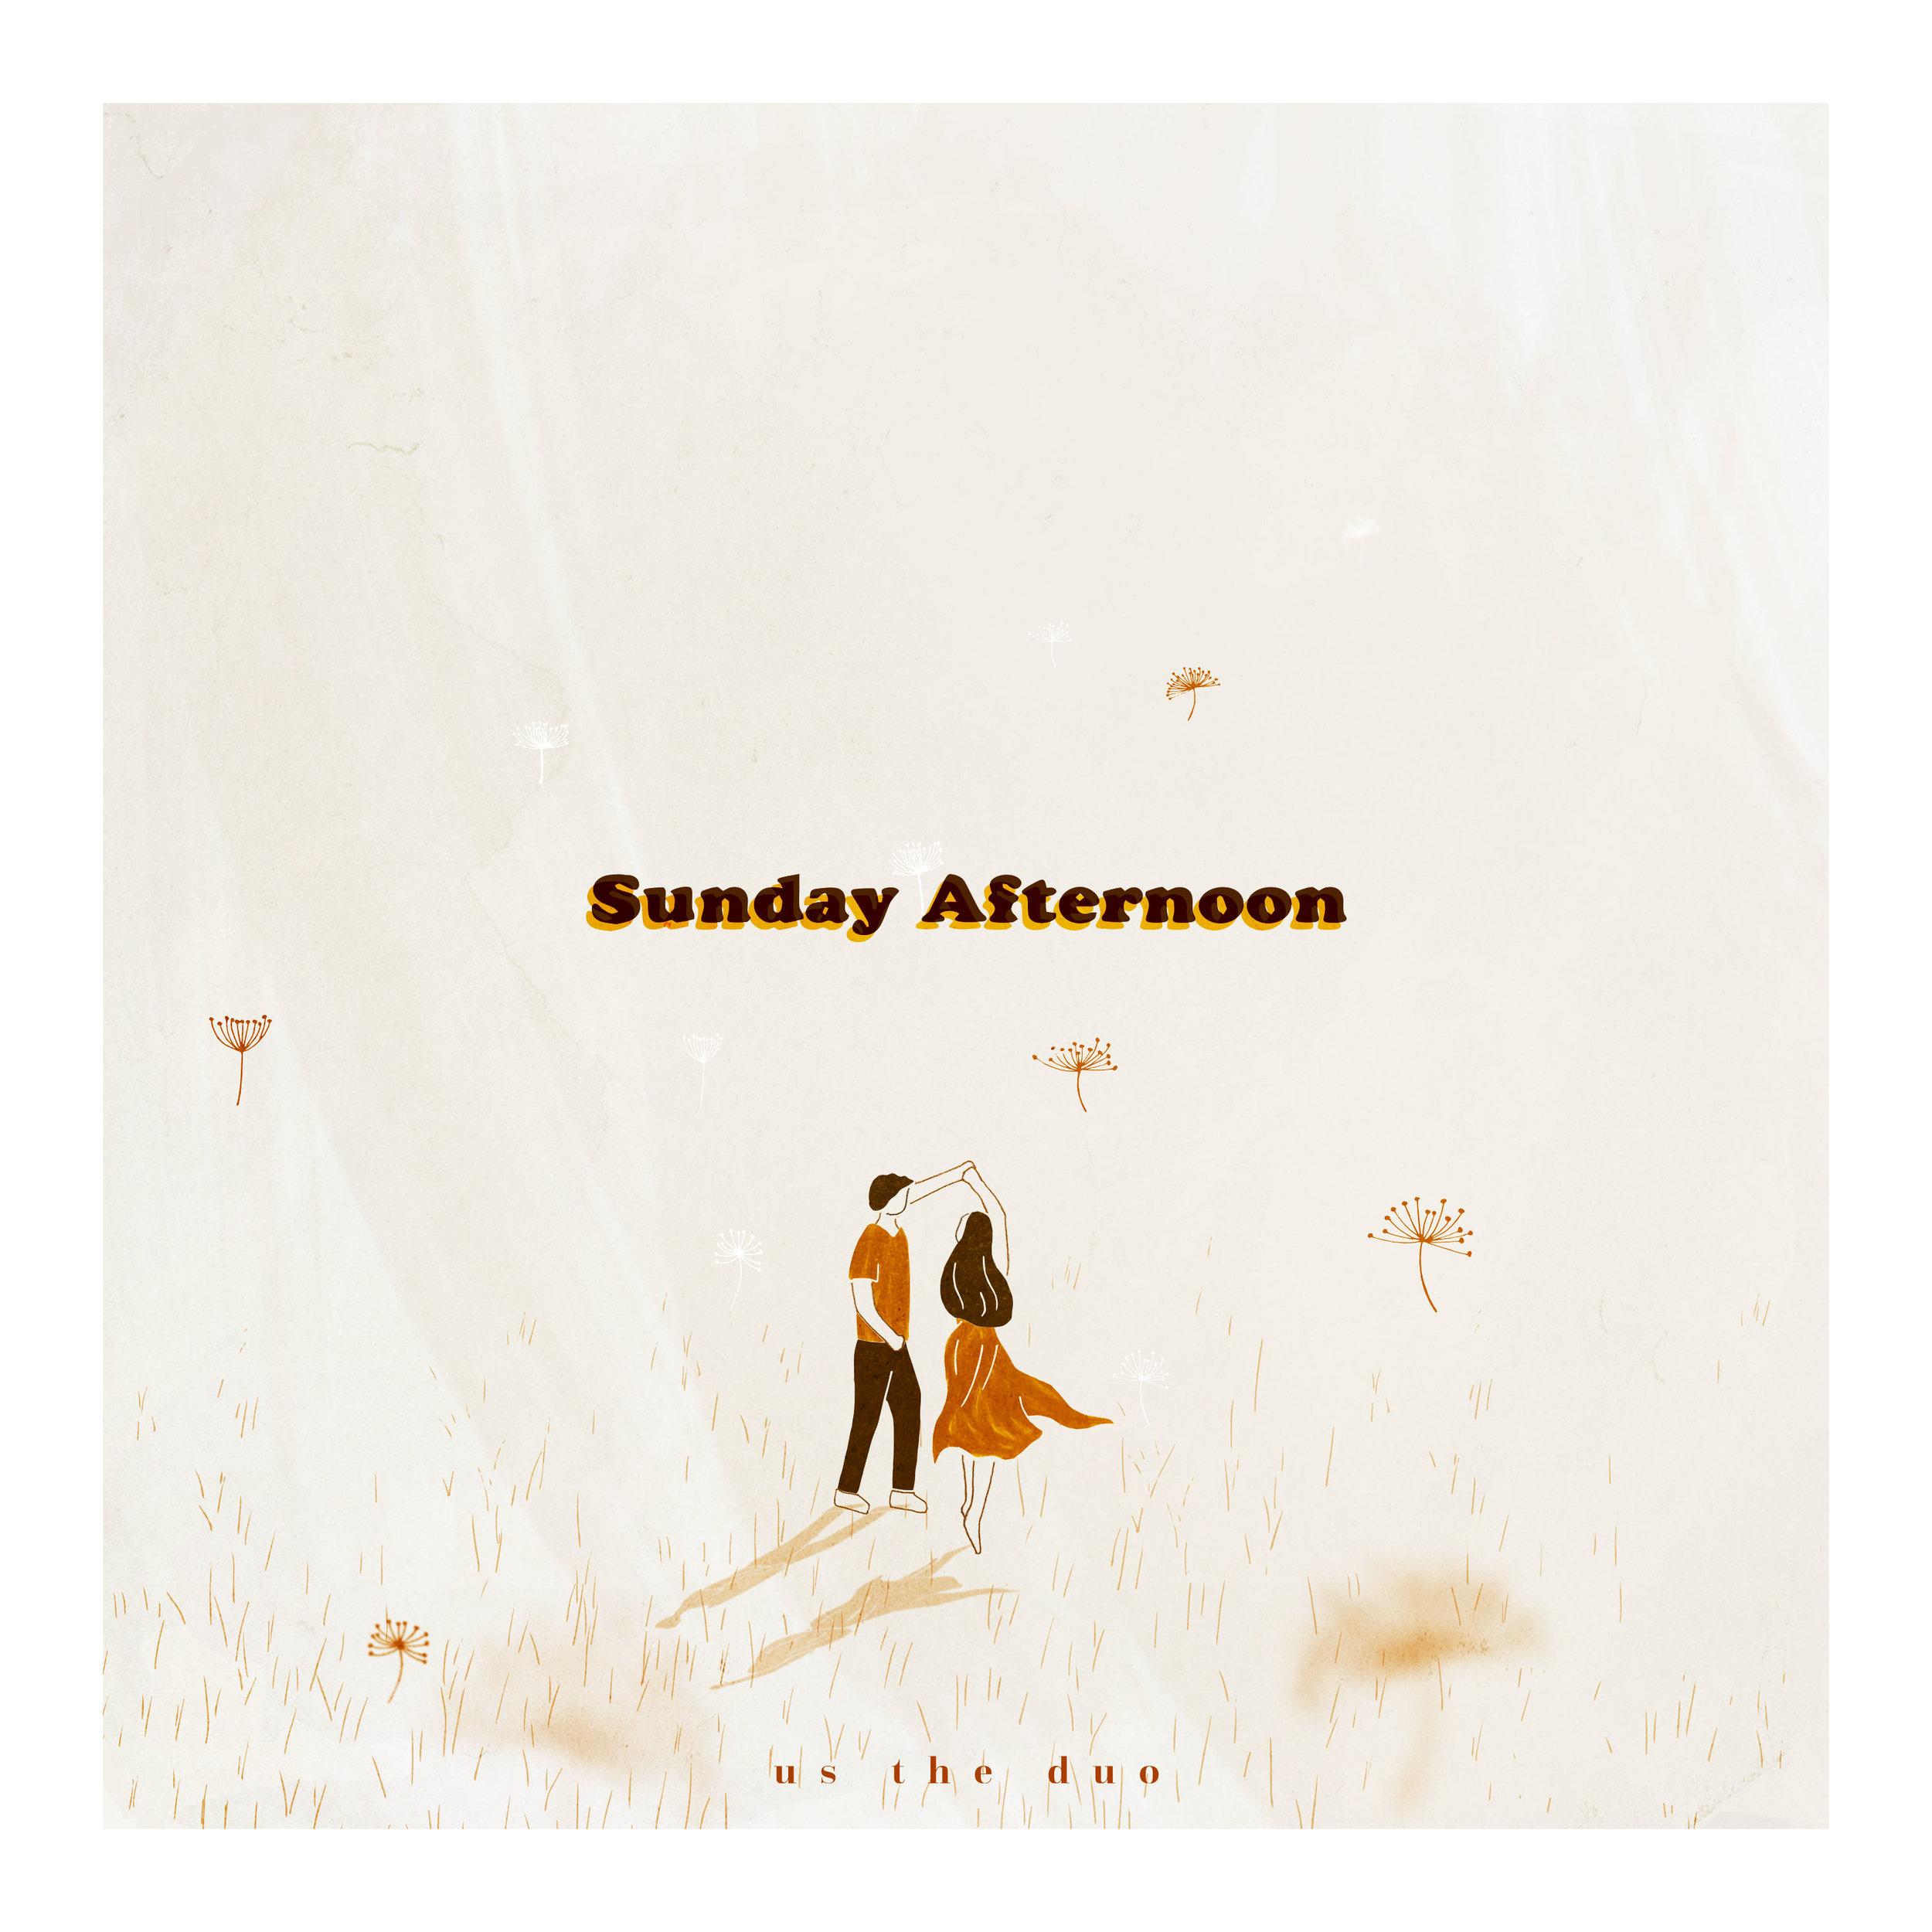 20190716-sunday-afternoon_final.jpg